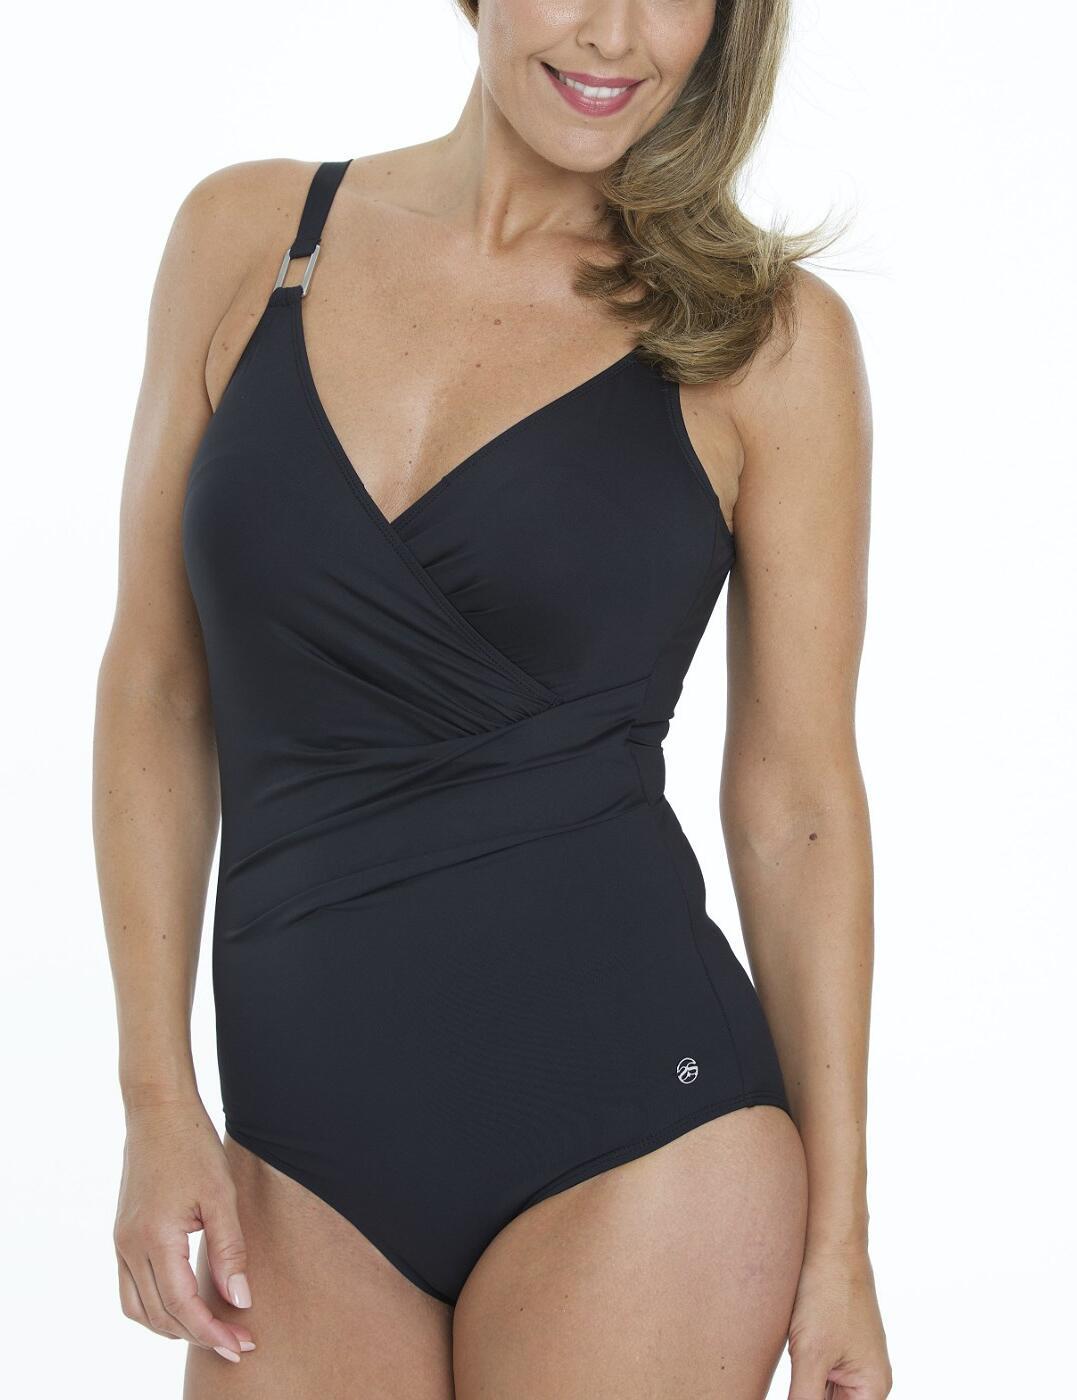 33-2184 SeaSpray Just Colour Plain Draped Swimsuit - 33-2184 Black